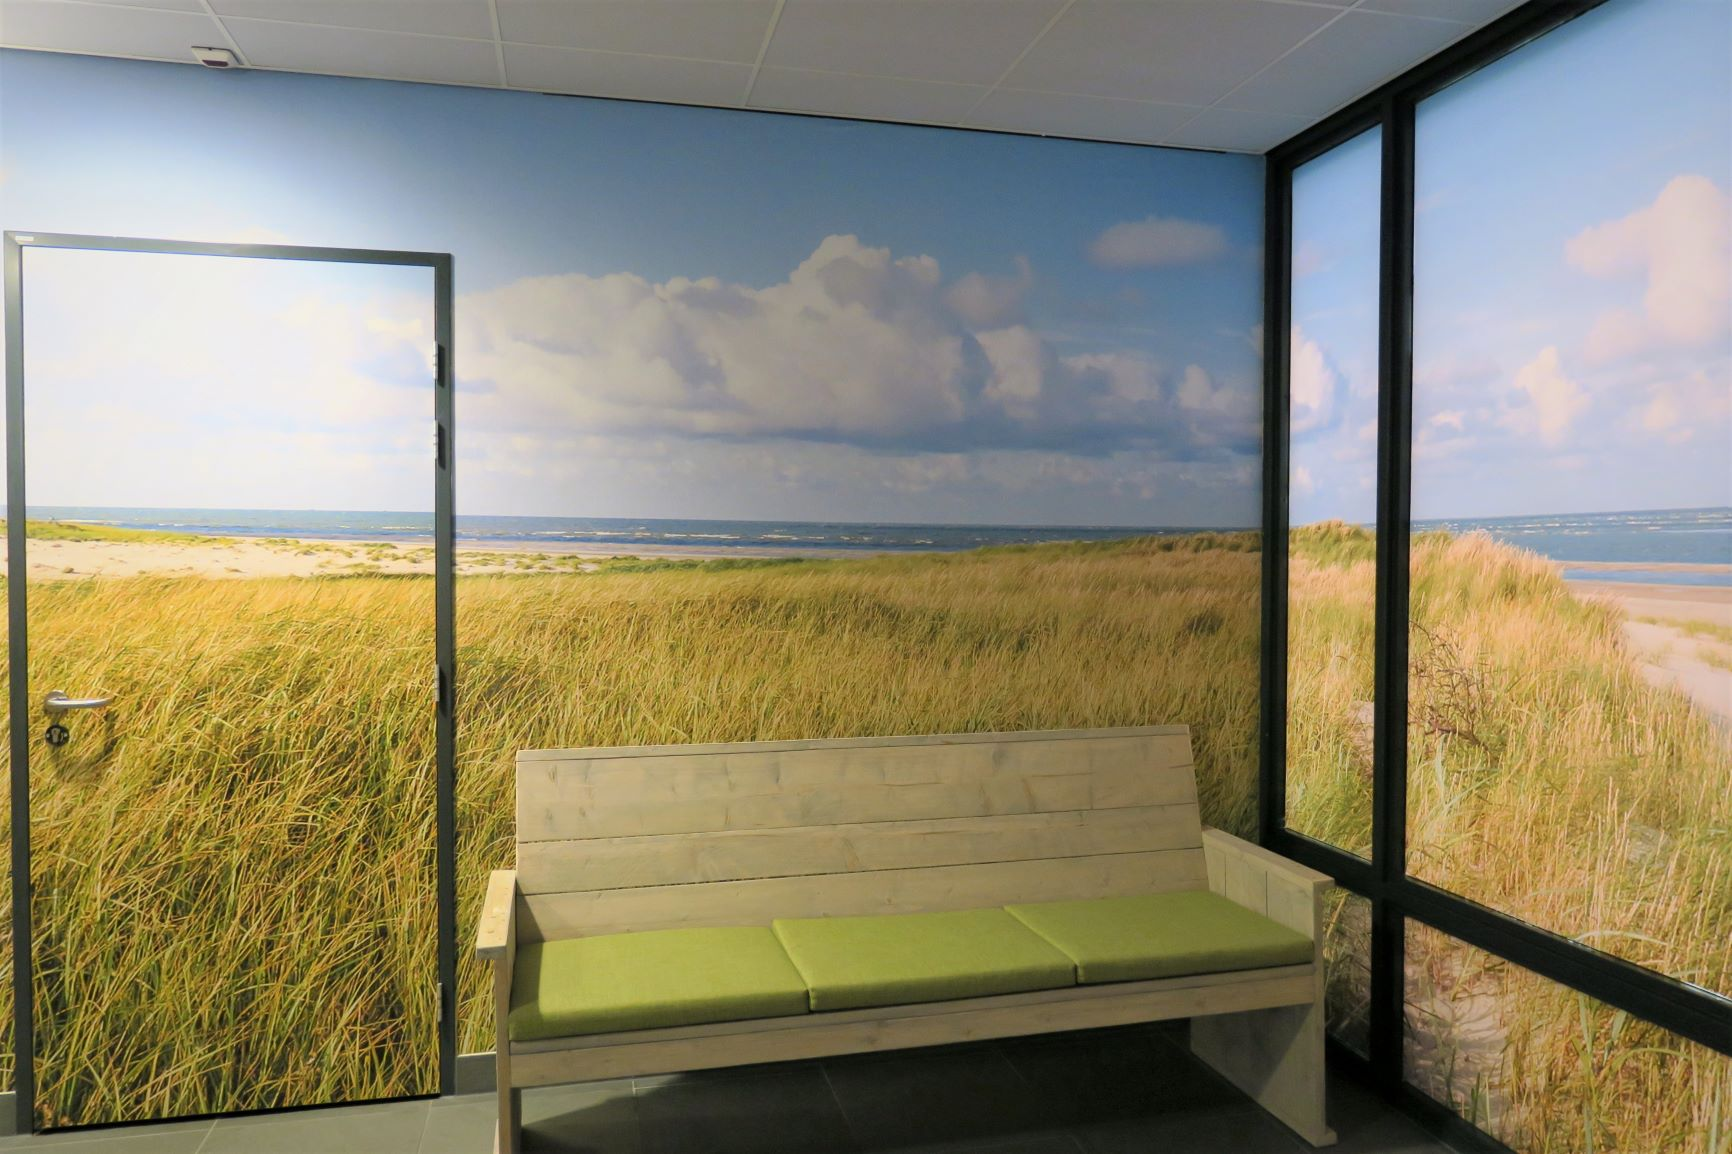 raamdecoratie raamfolie foto print